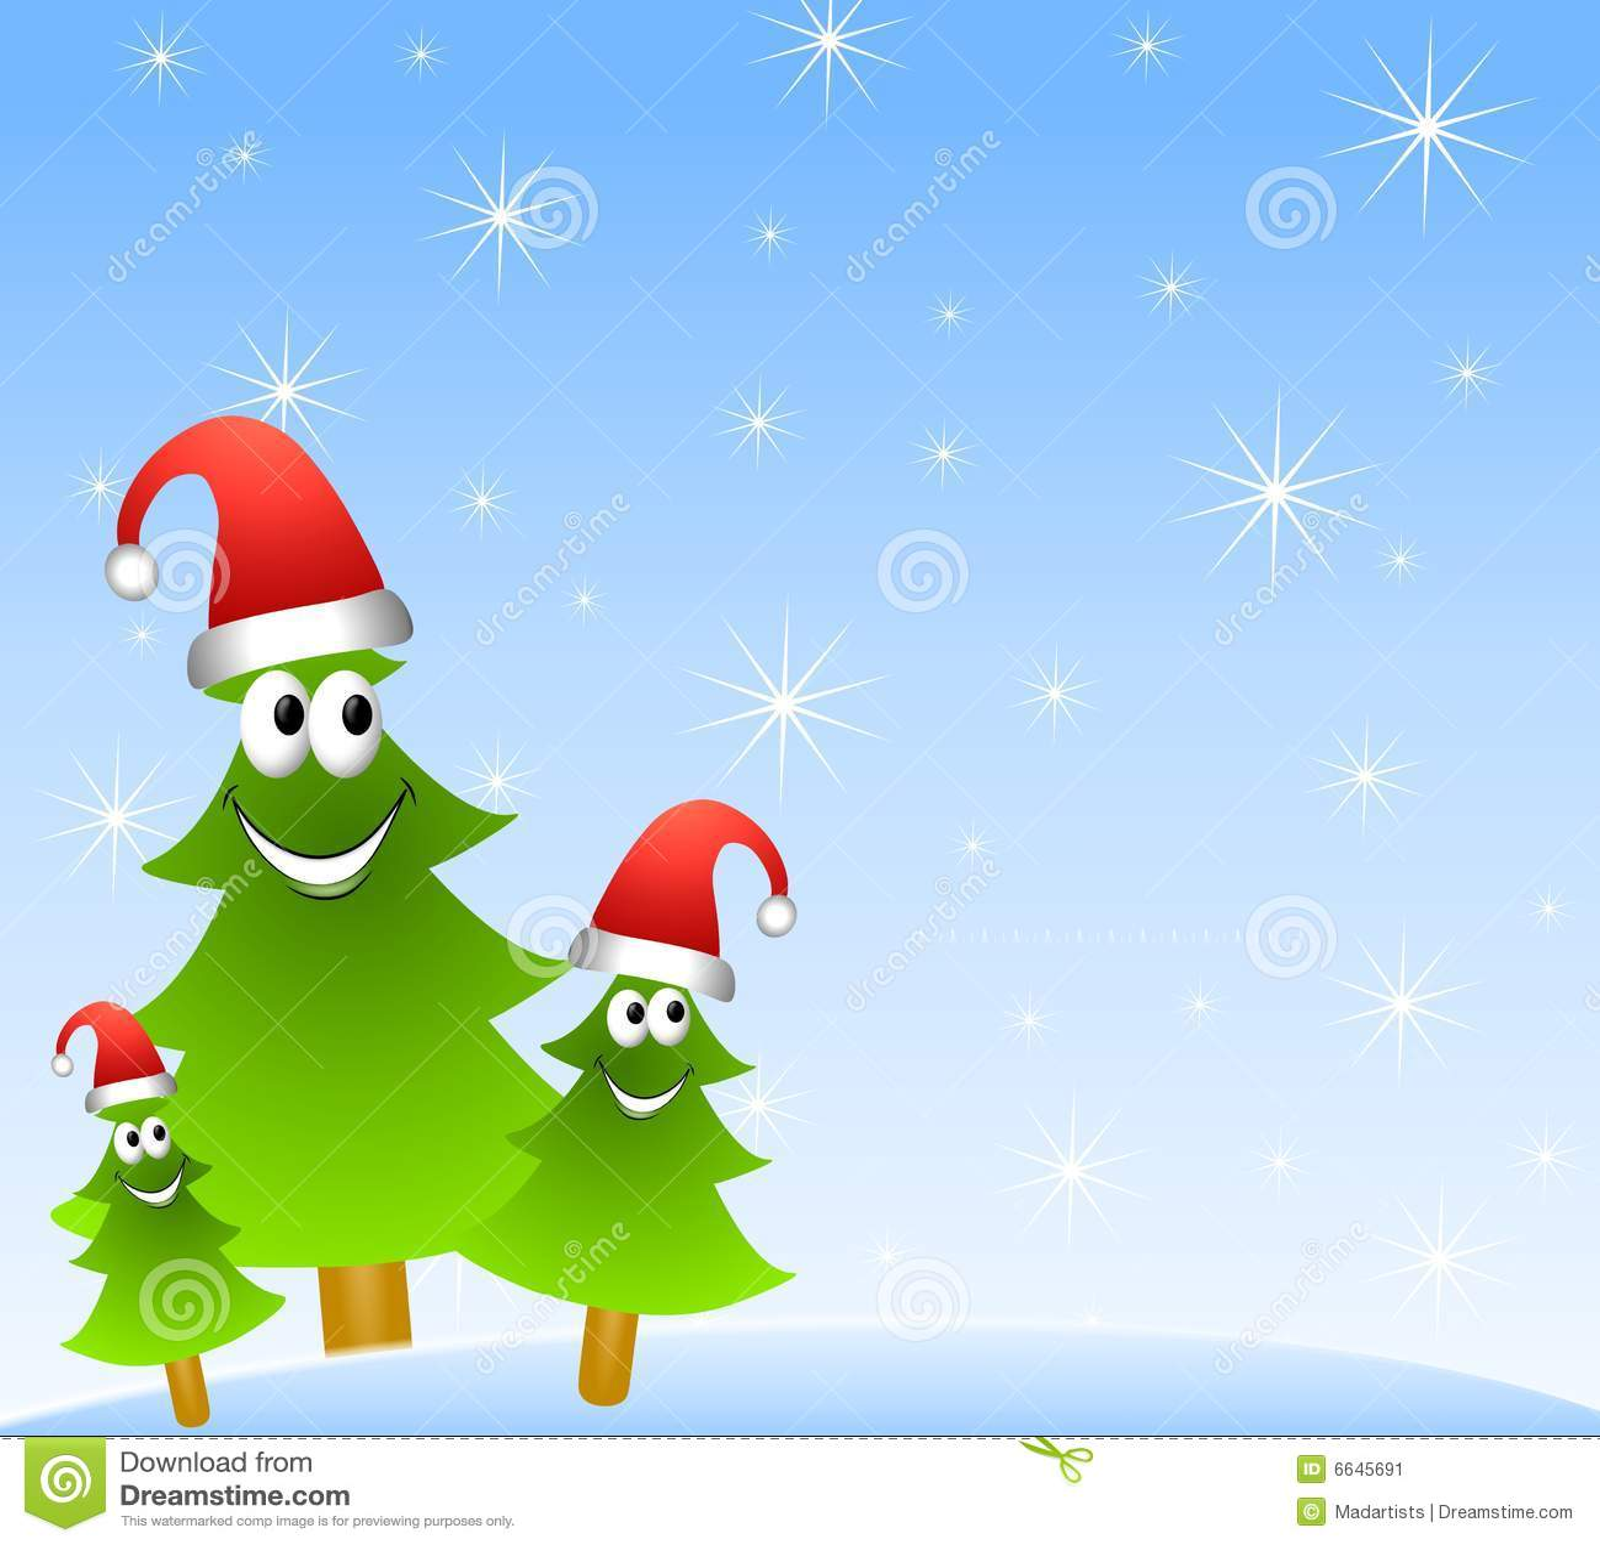 karikatur weihnachtsbaum gruppe stockbild bild 6645691. Black Bedroom Furniture Sets. Home Design Ideas